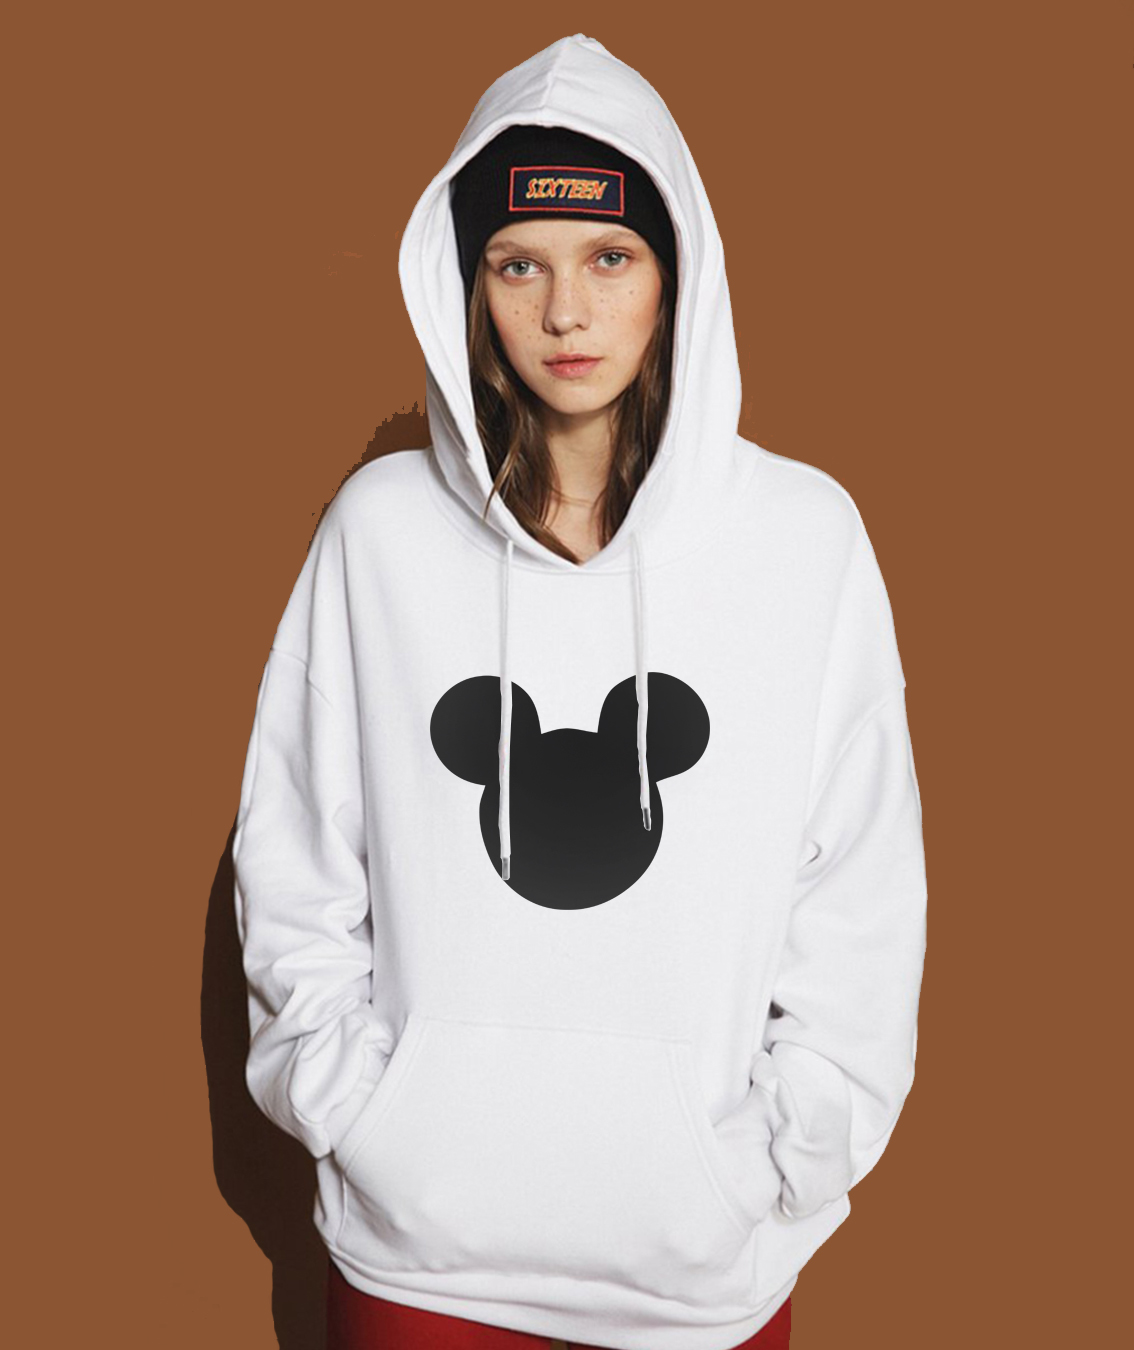 Hoody For Women 2018 Spring Fashion Streetwear Hoodies Winter Sweatshirt Women s Streetwear Harajuku Brand Clothing